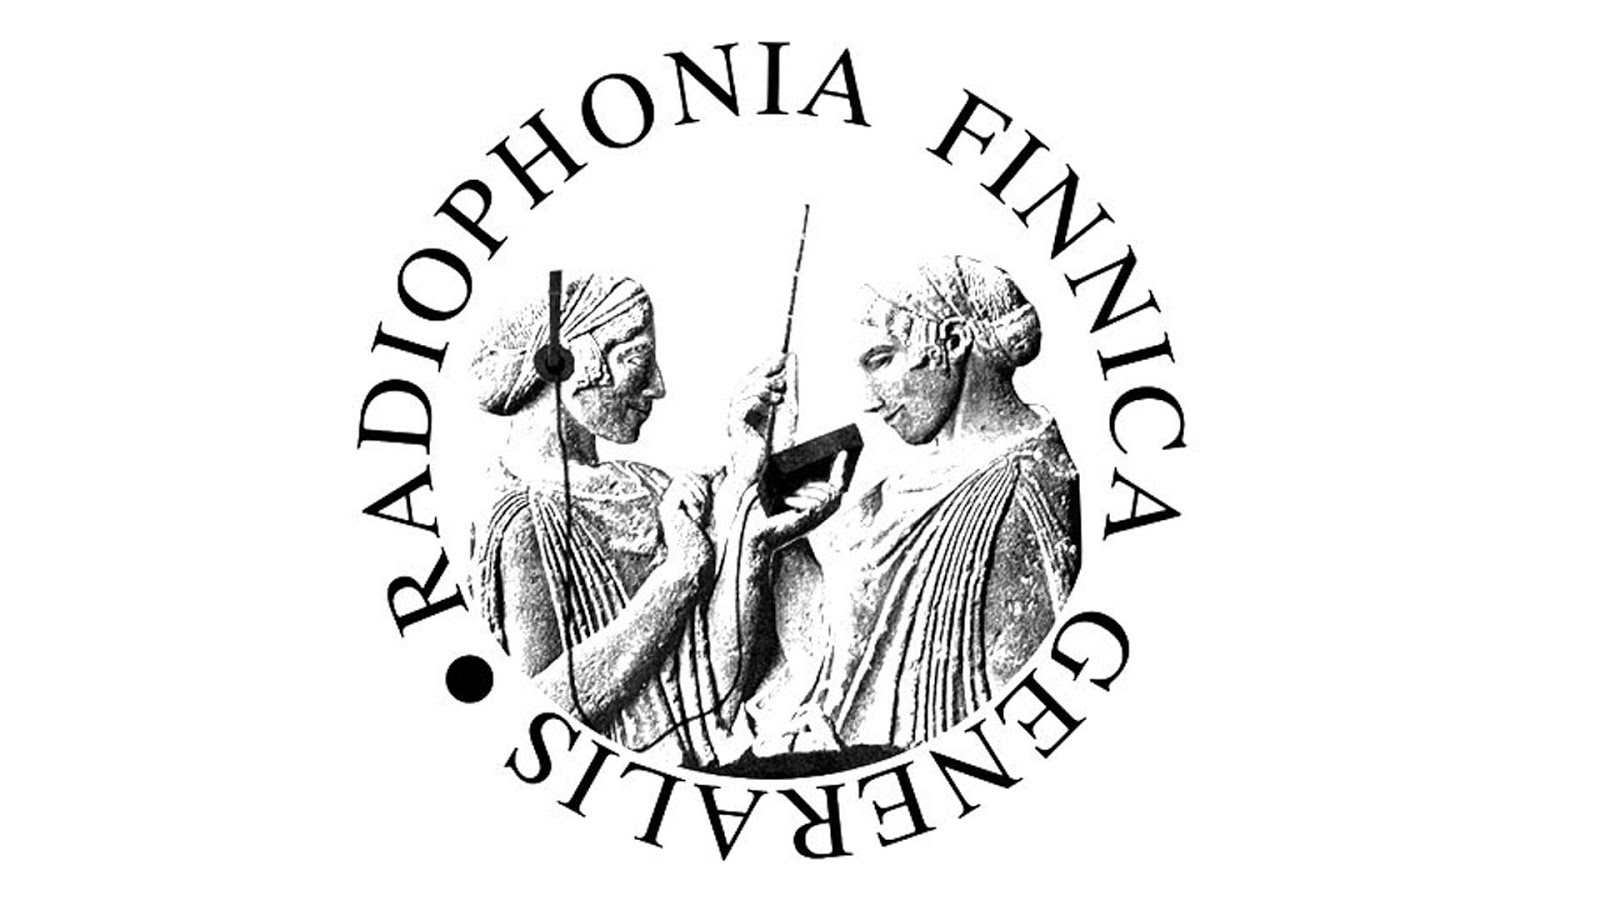 Radiophonia Finnica